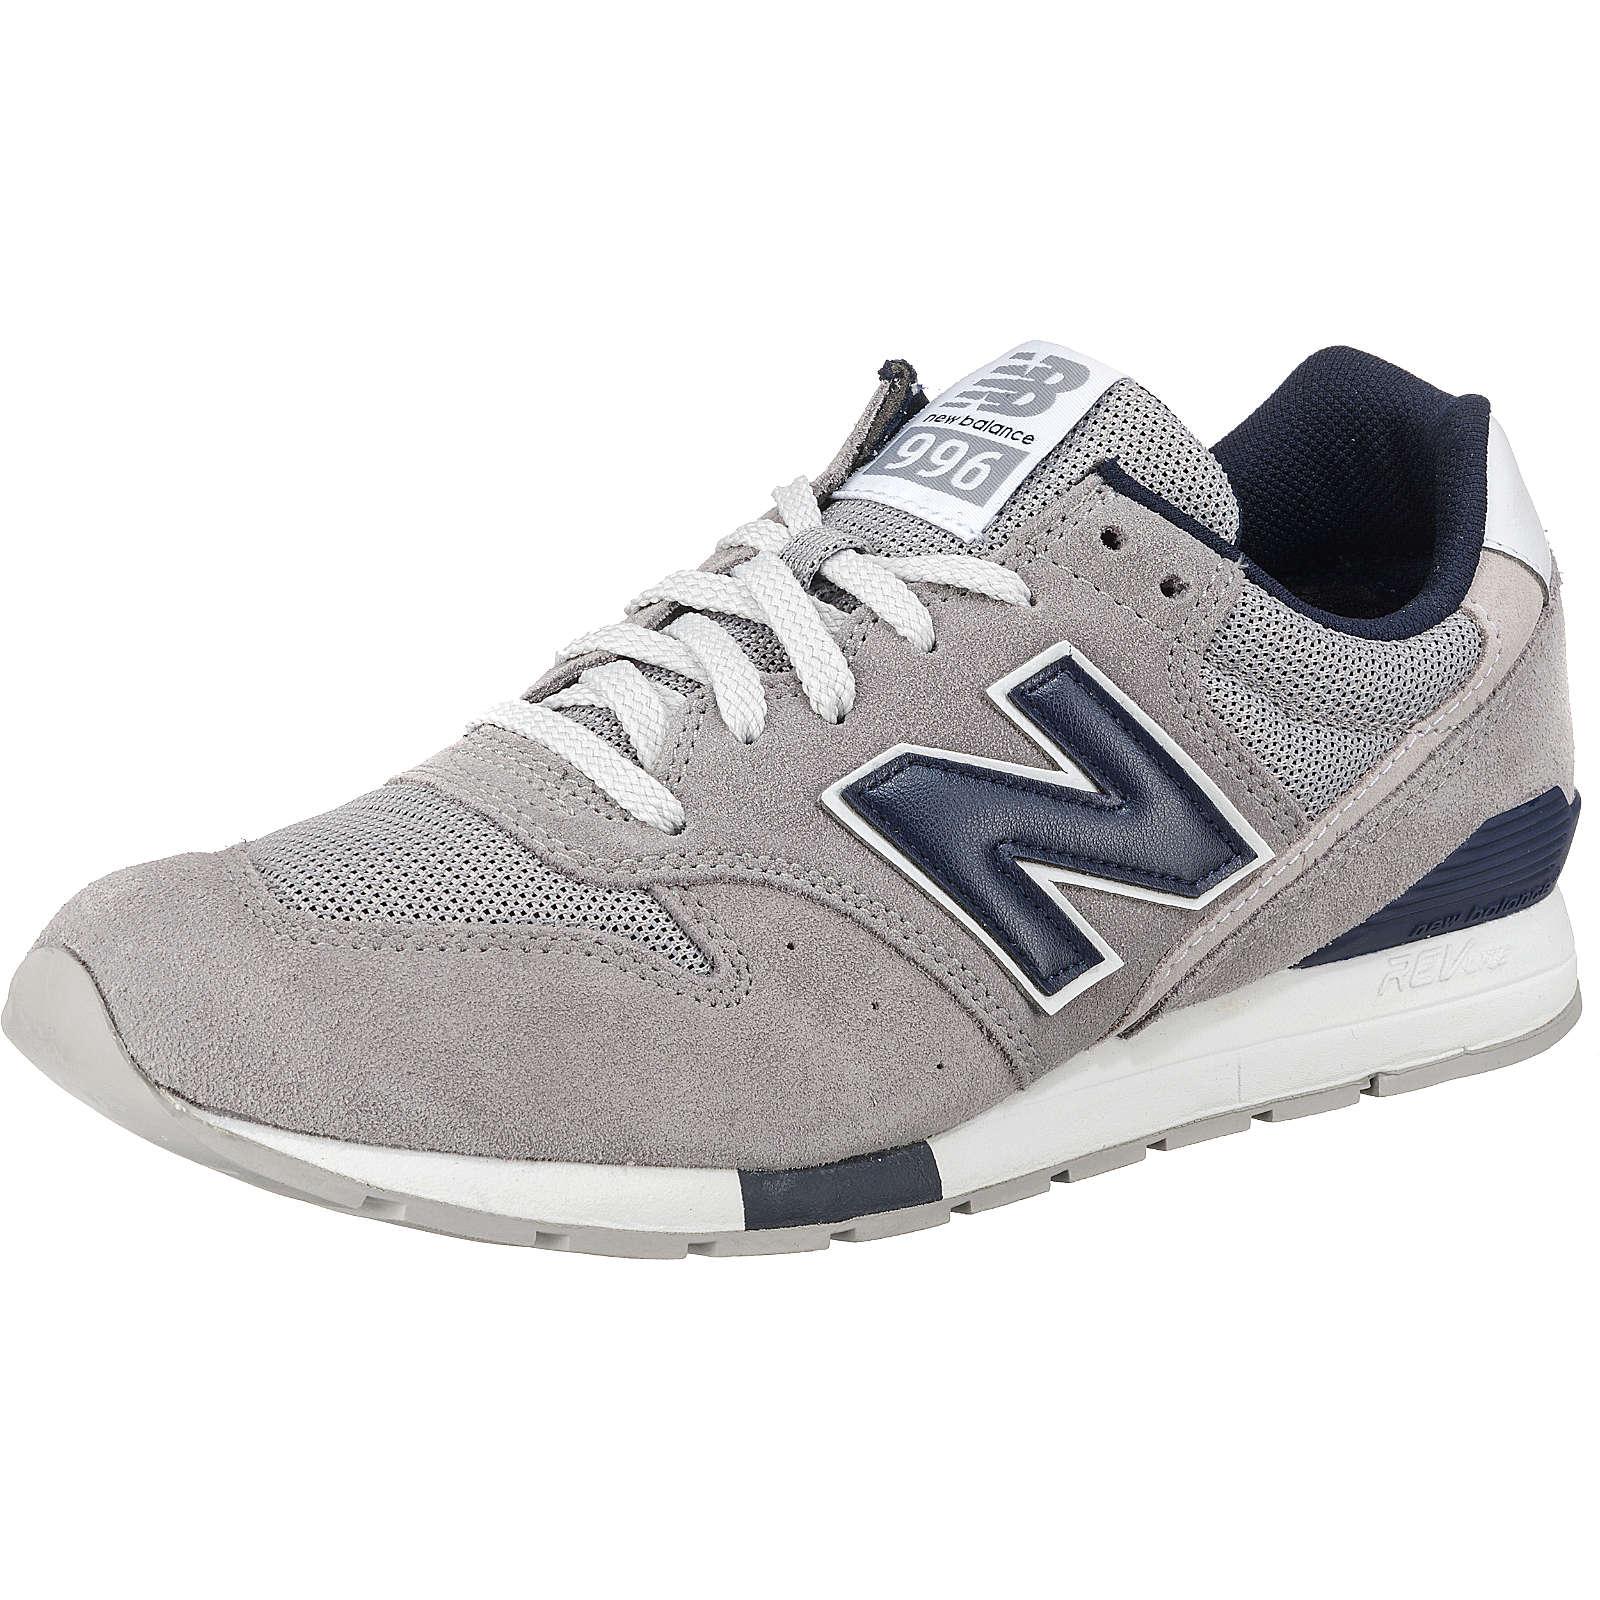 new balance MRL996 Sneakers Low grau Herren Gr. 44